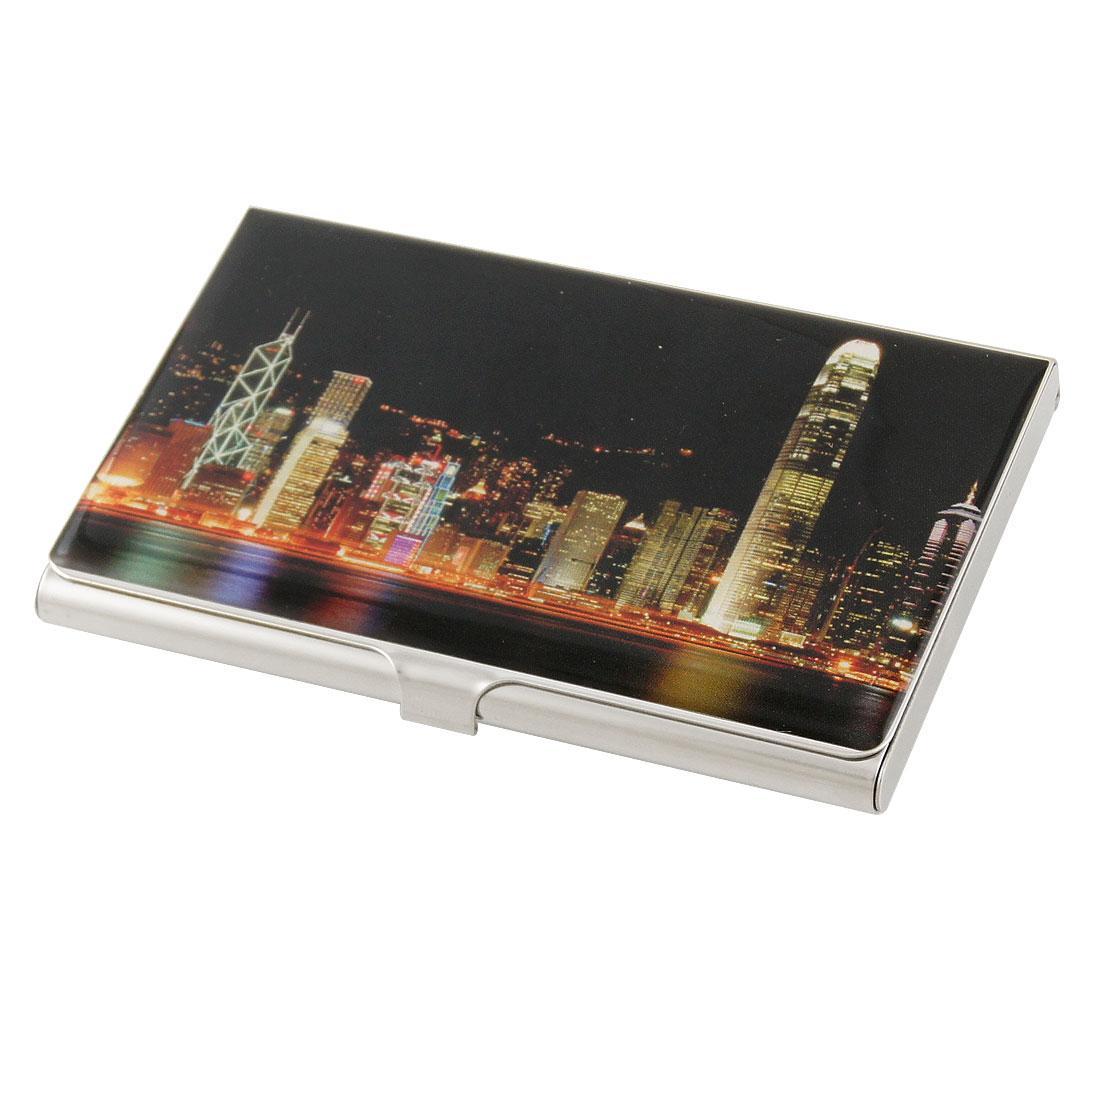 Black Background Central Night Scene Stainless Steel Horizontal Card Holder Box